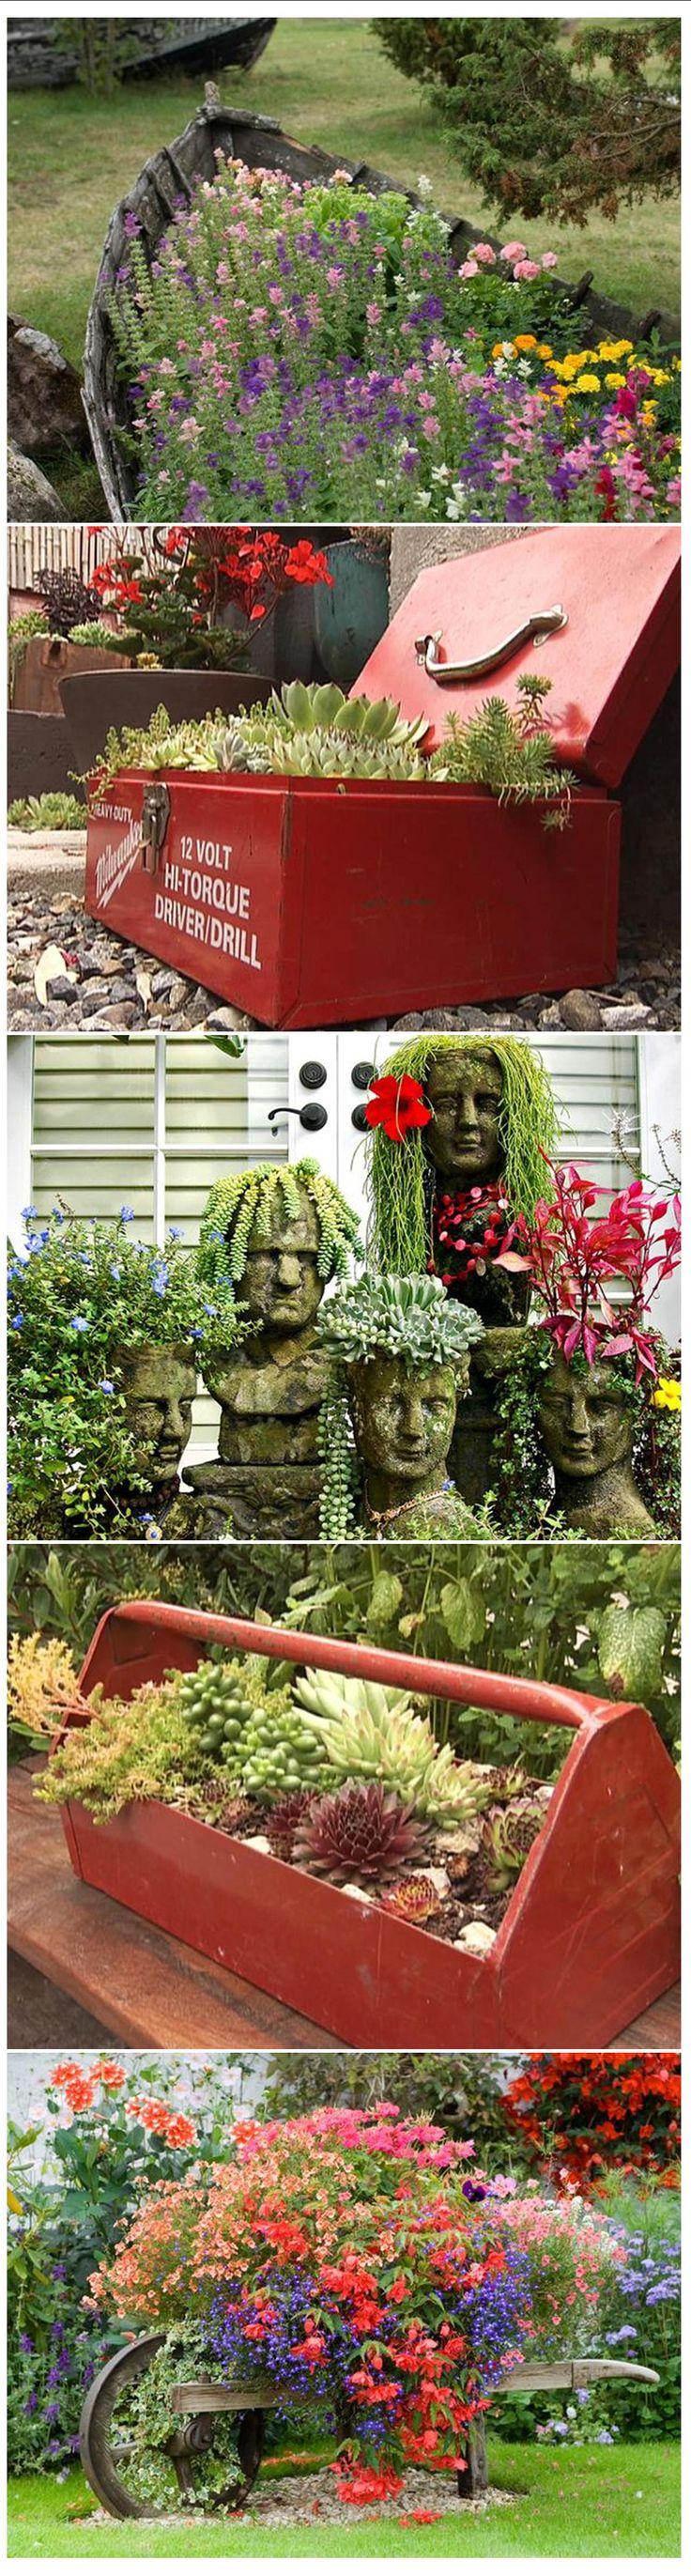 i♥Garden | ..upcycle 'Container Garden' ideas - old boat, tool boxes, facial pots, old wheelbarrow (love it)